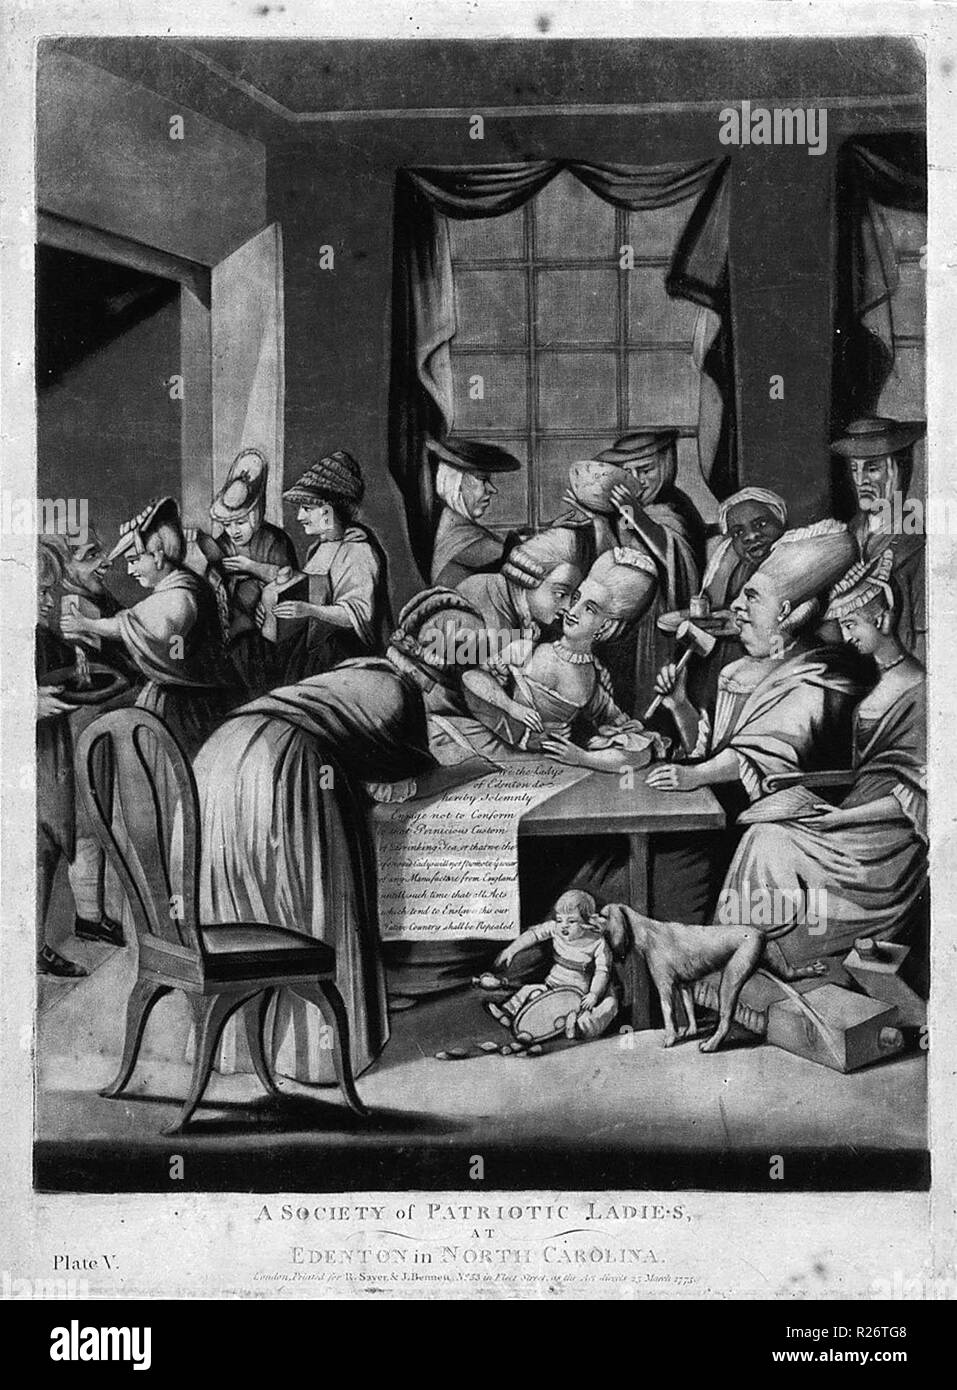 This 1775 British cartoon, A Society of Patriotic Ladies at Edenton in North Carolina, satirizes the Edenton Tea Party, a group of women who organized a boycott of English tea. - Stock Image